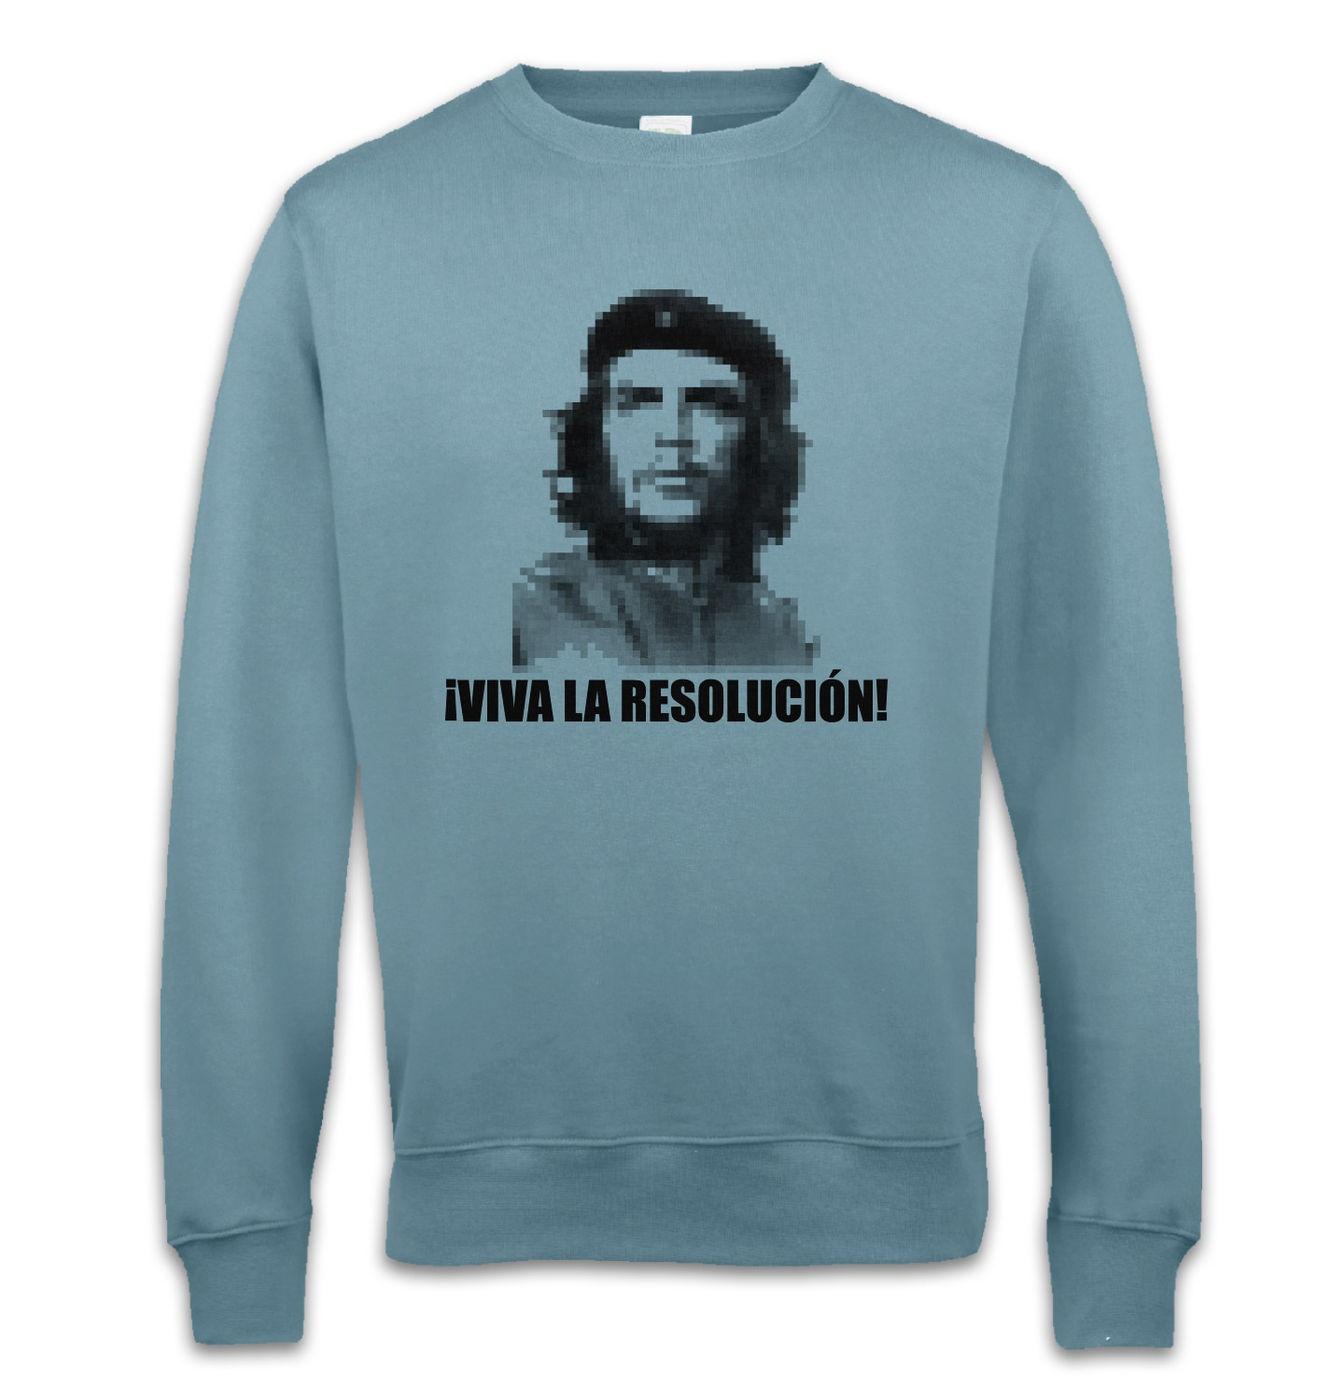 Viva La Resolucion sweatshirt - Funny geeky Che Guevara sweater